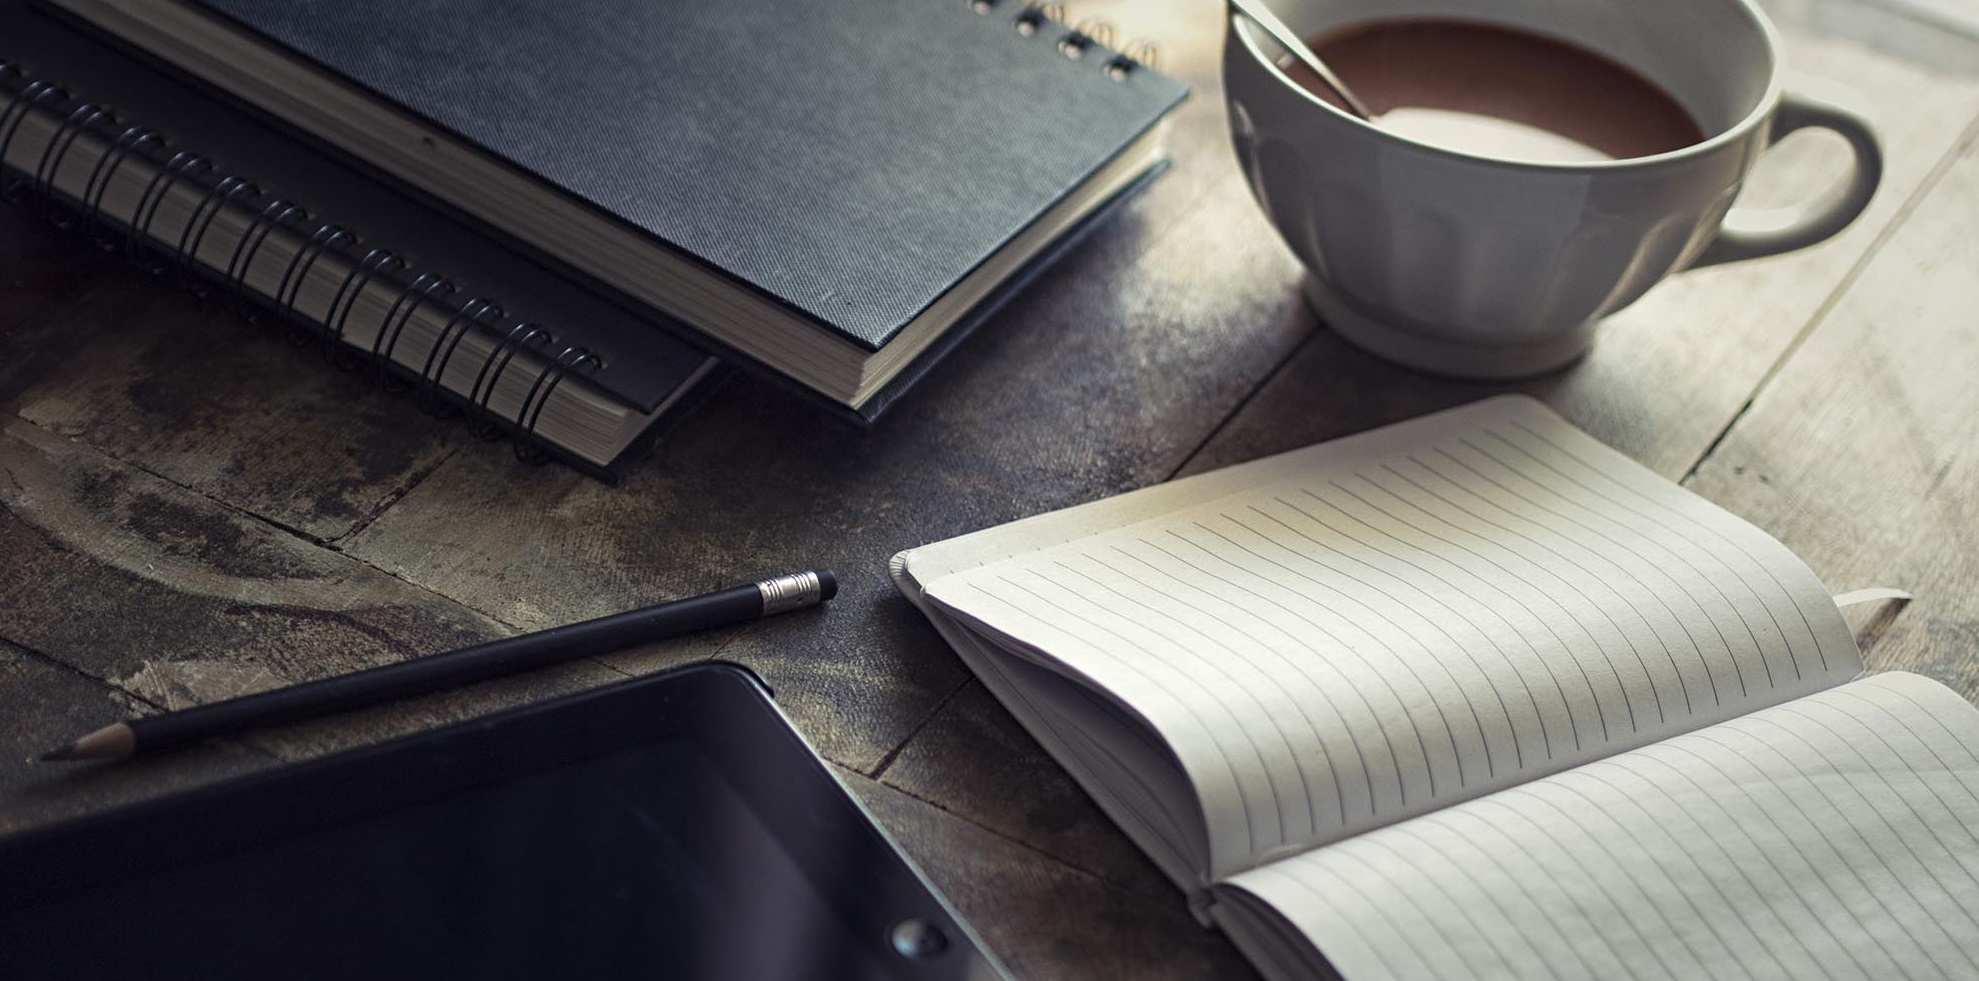 journaling style - bullet journal